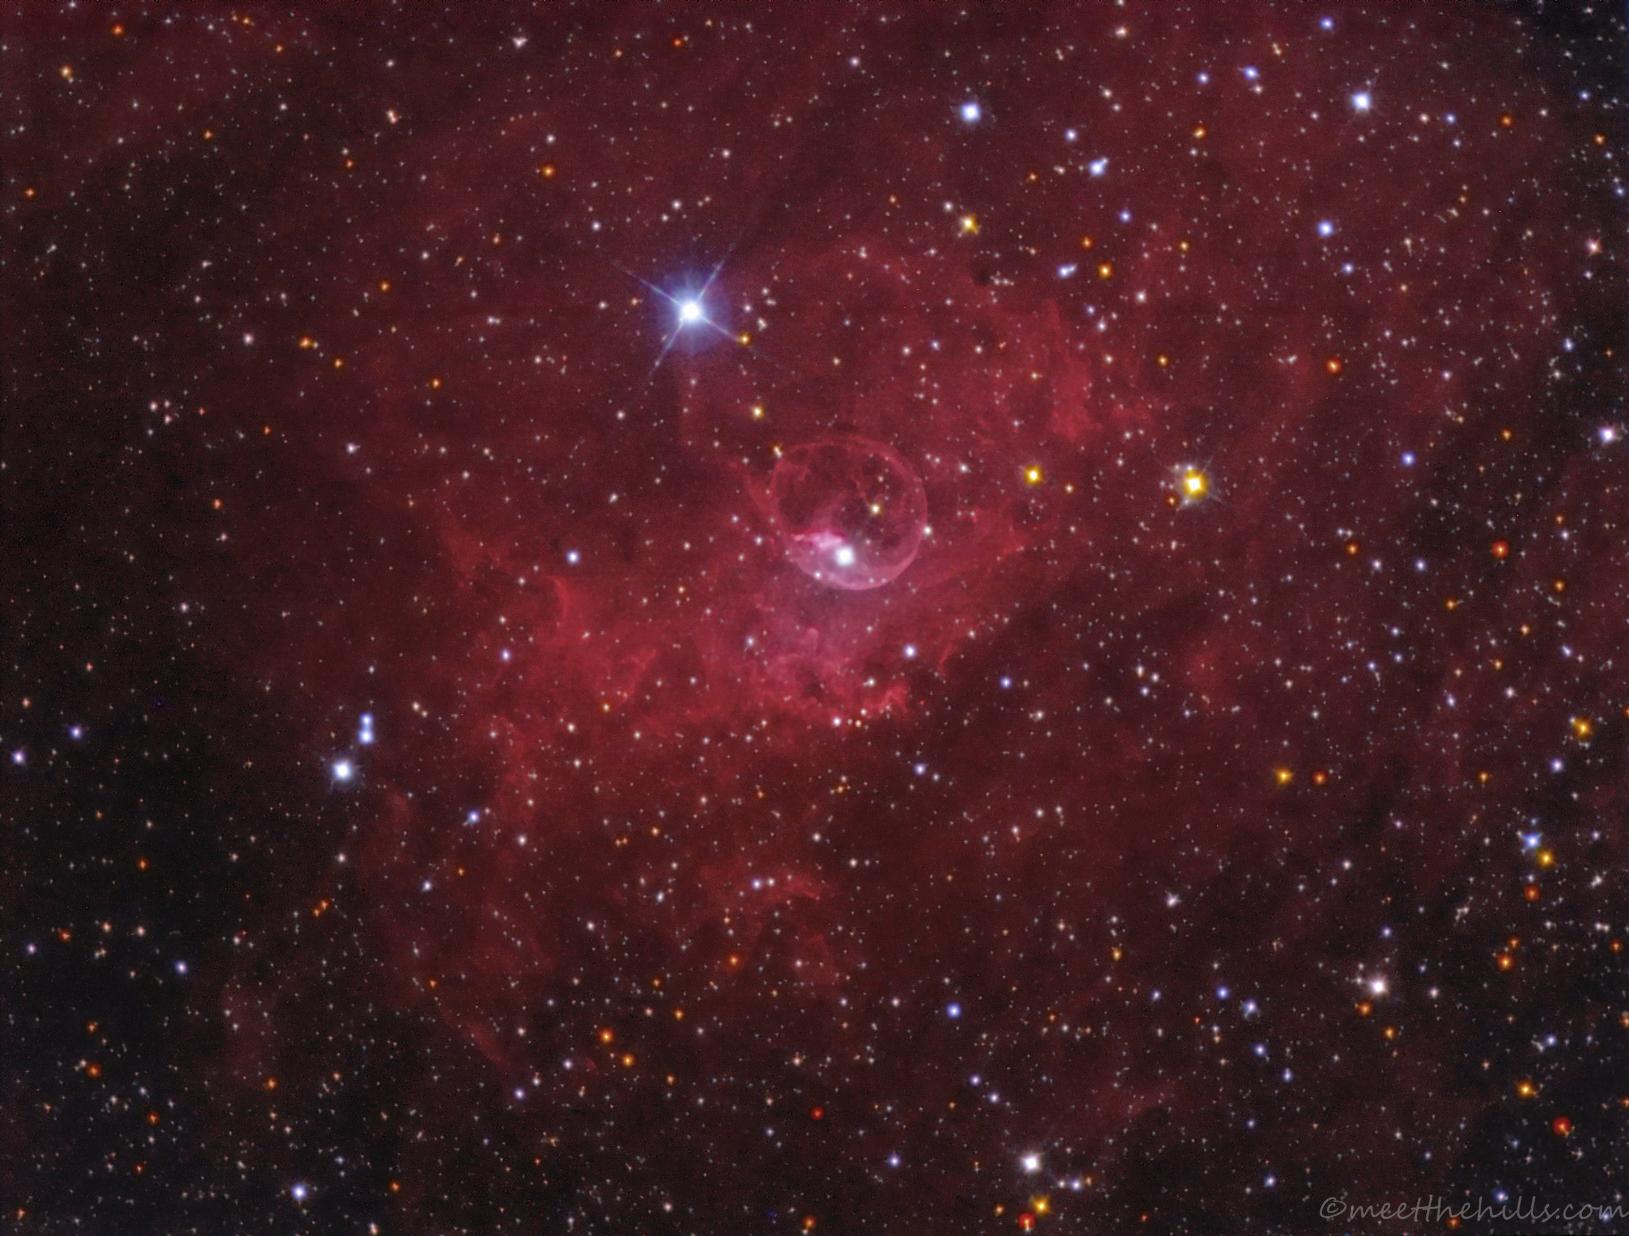 NGC7635 - Bubble nebula in Cas